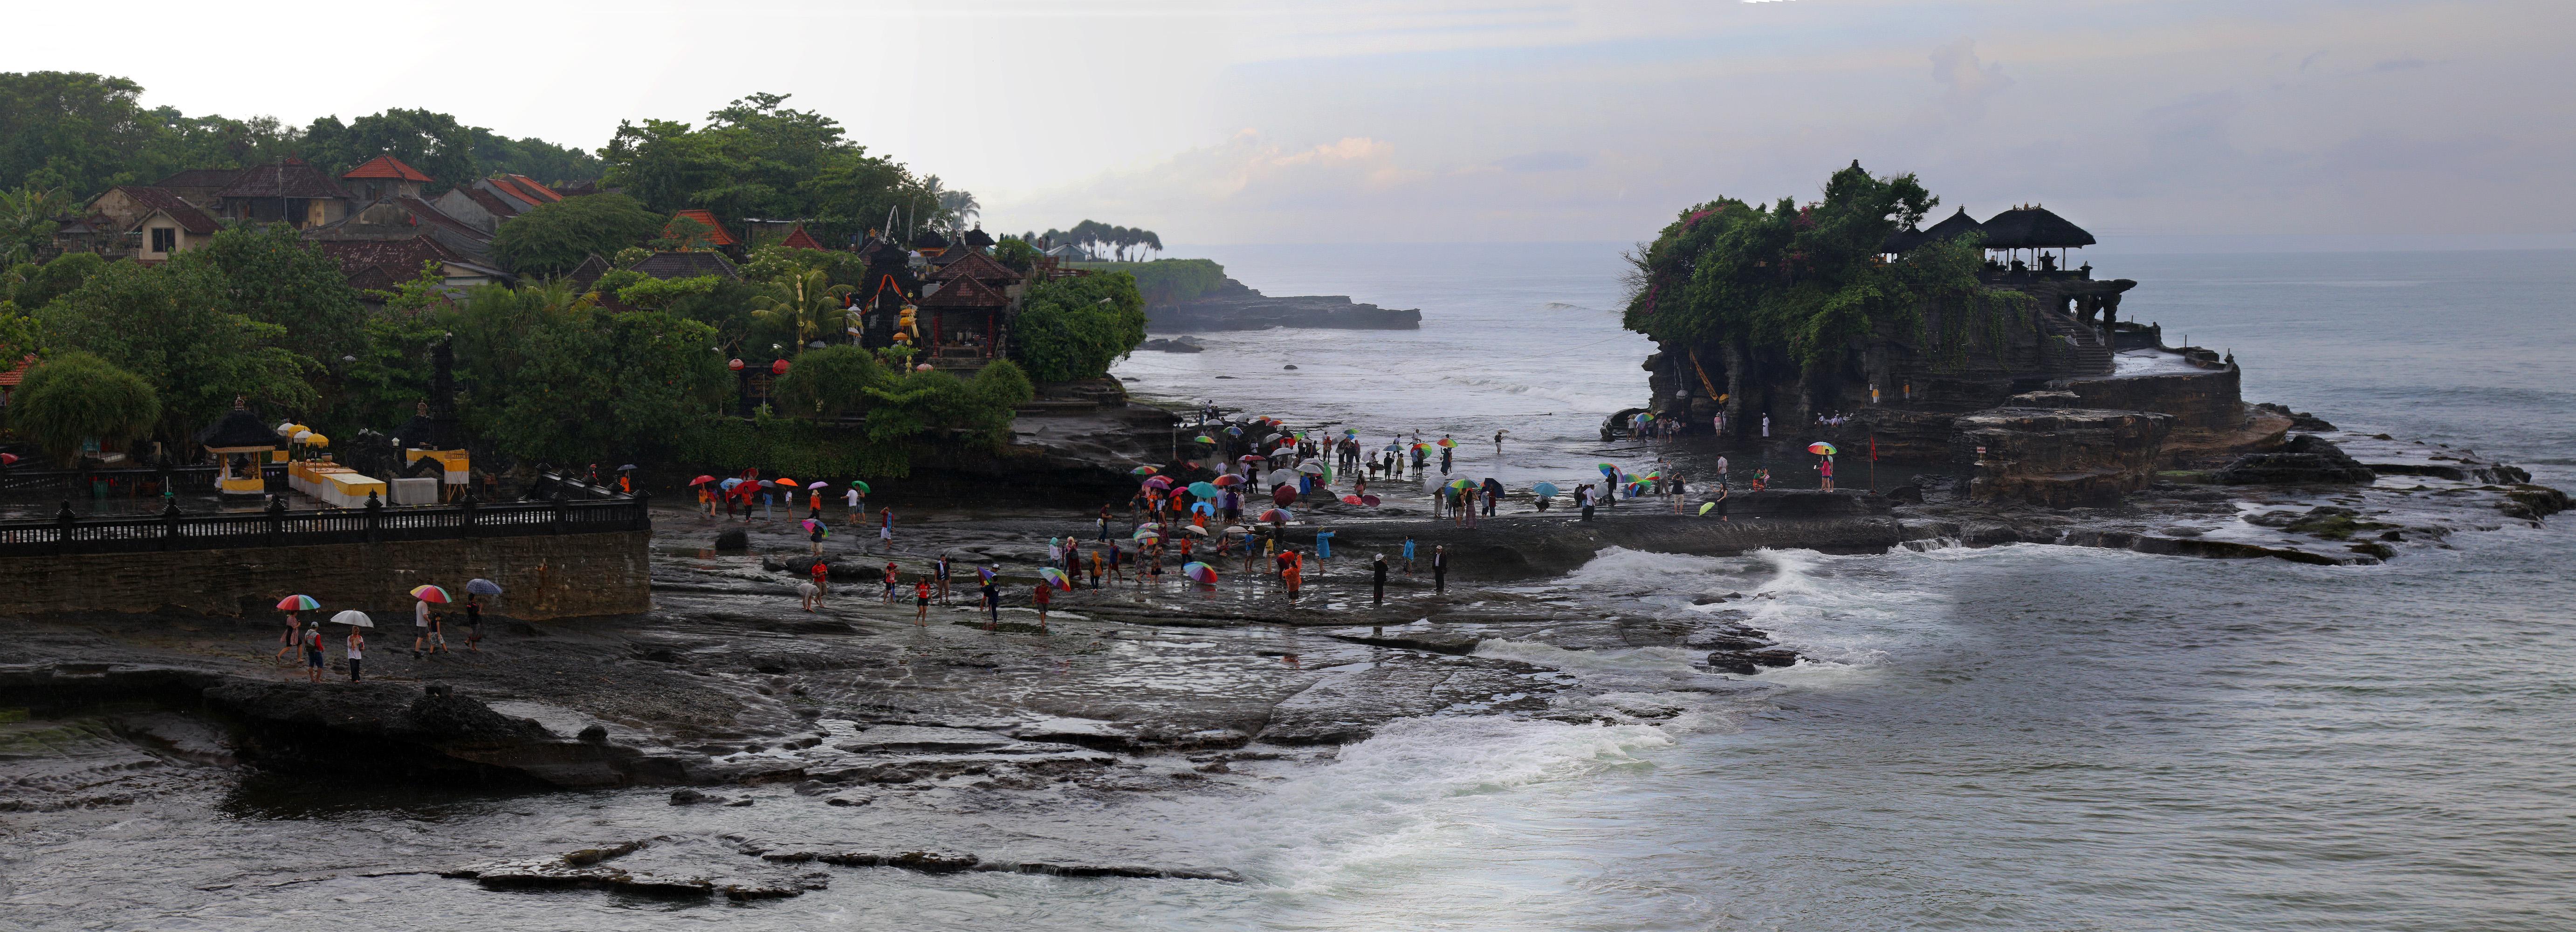 tanahlotpan Tanah Lot,  Bali, Indonesia, 2016